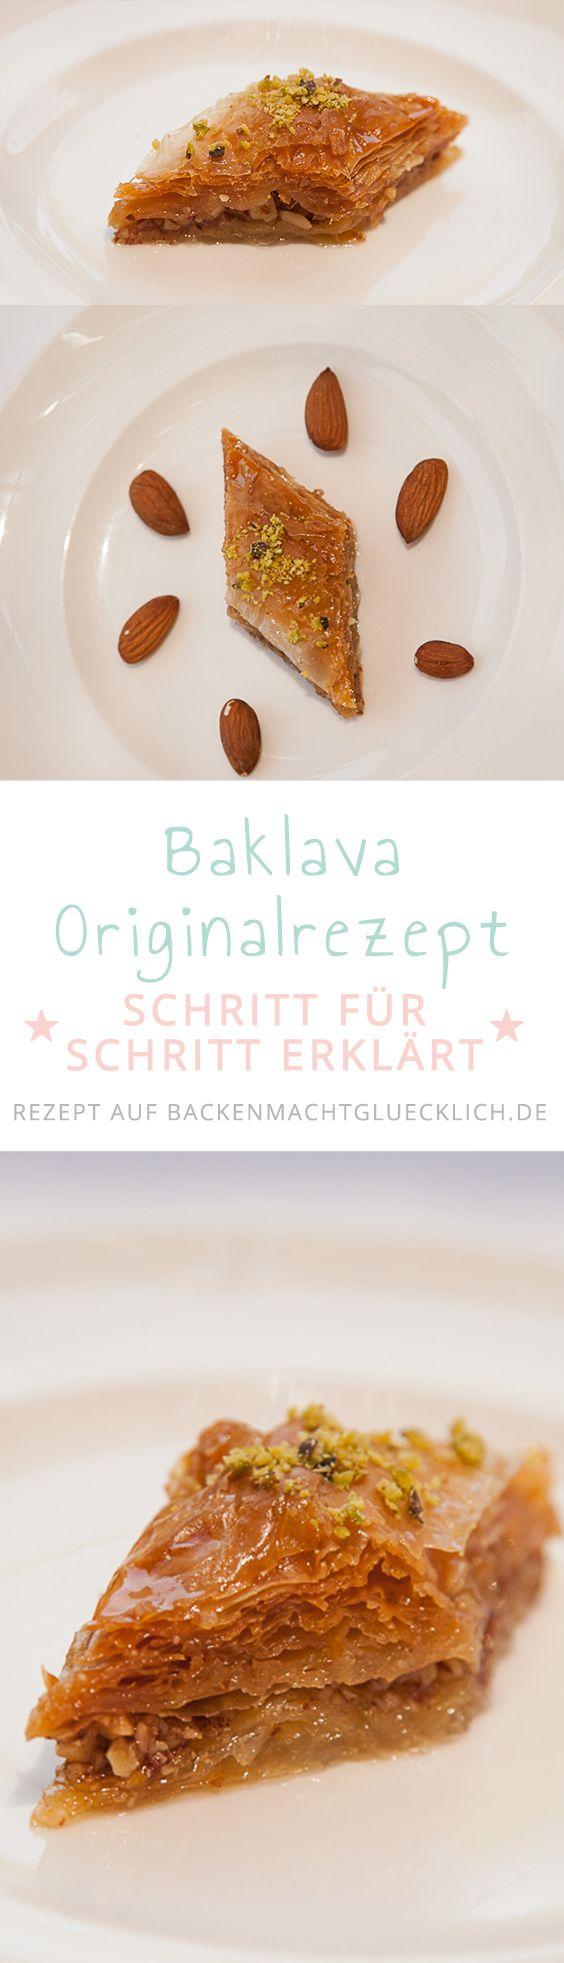 Baklava #cupcakesrezepte